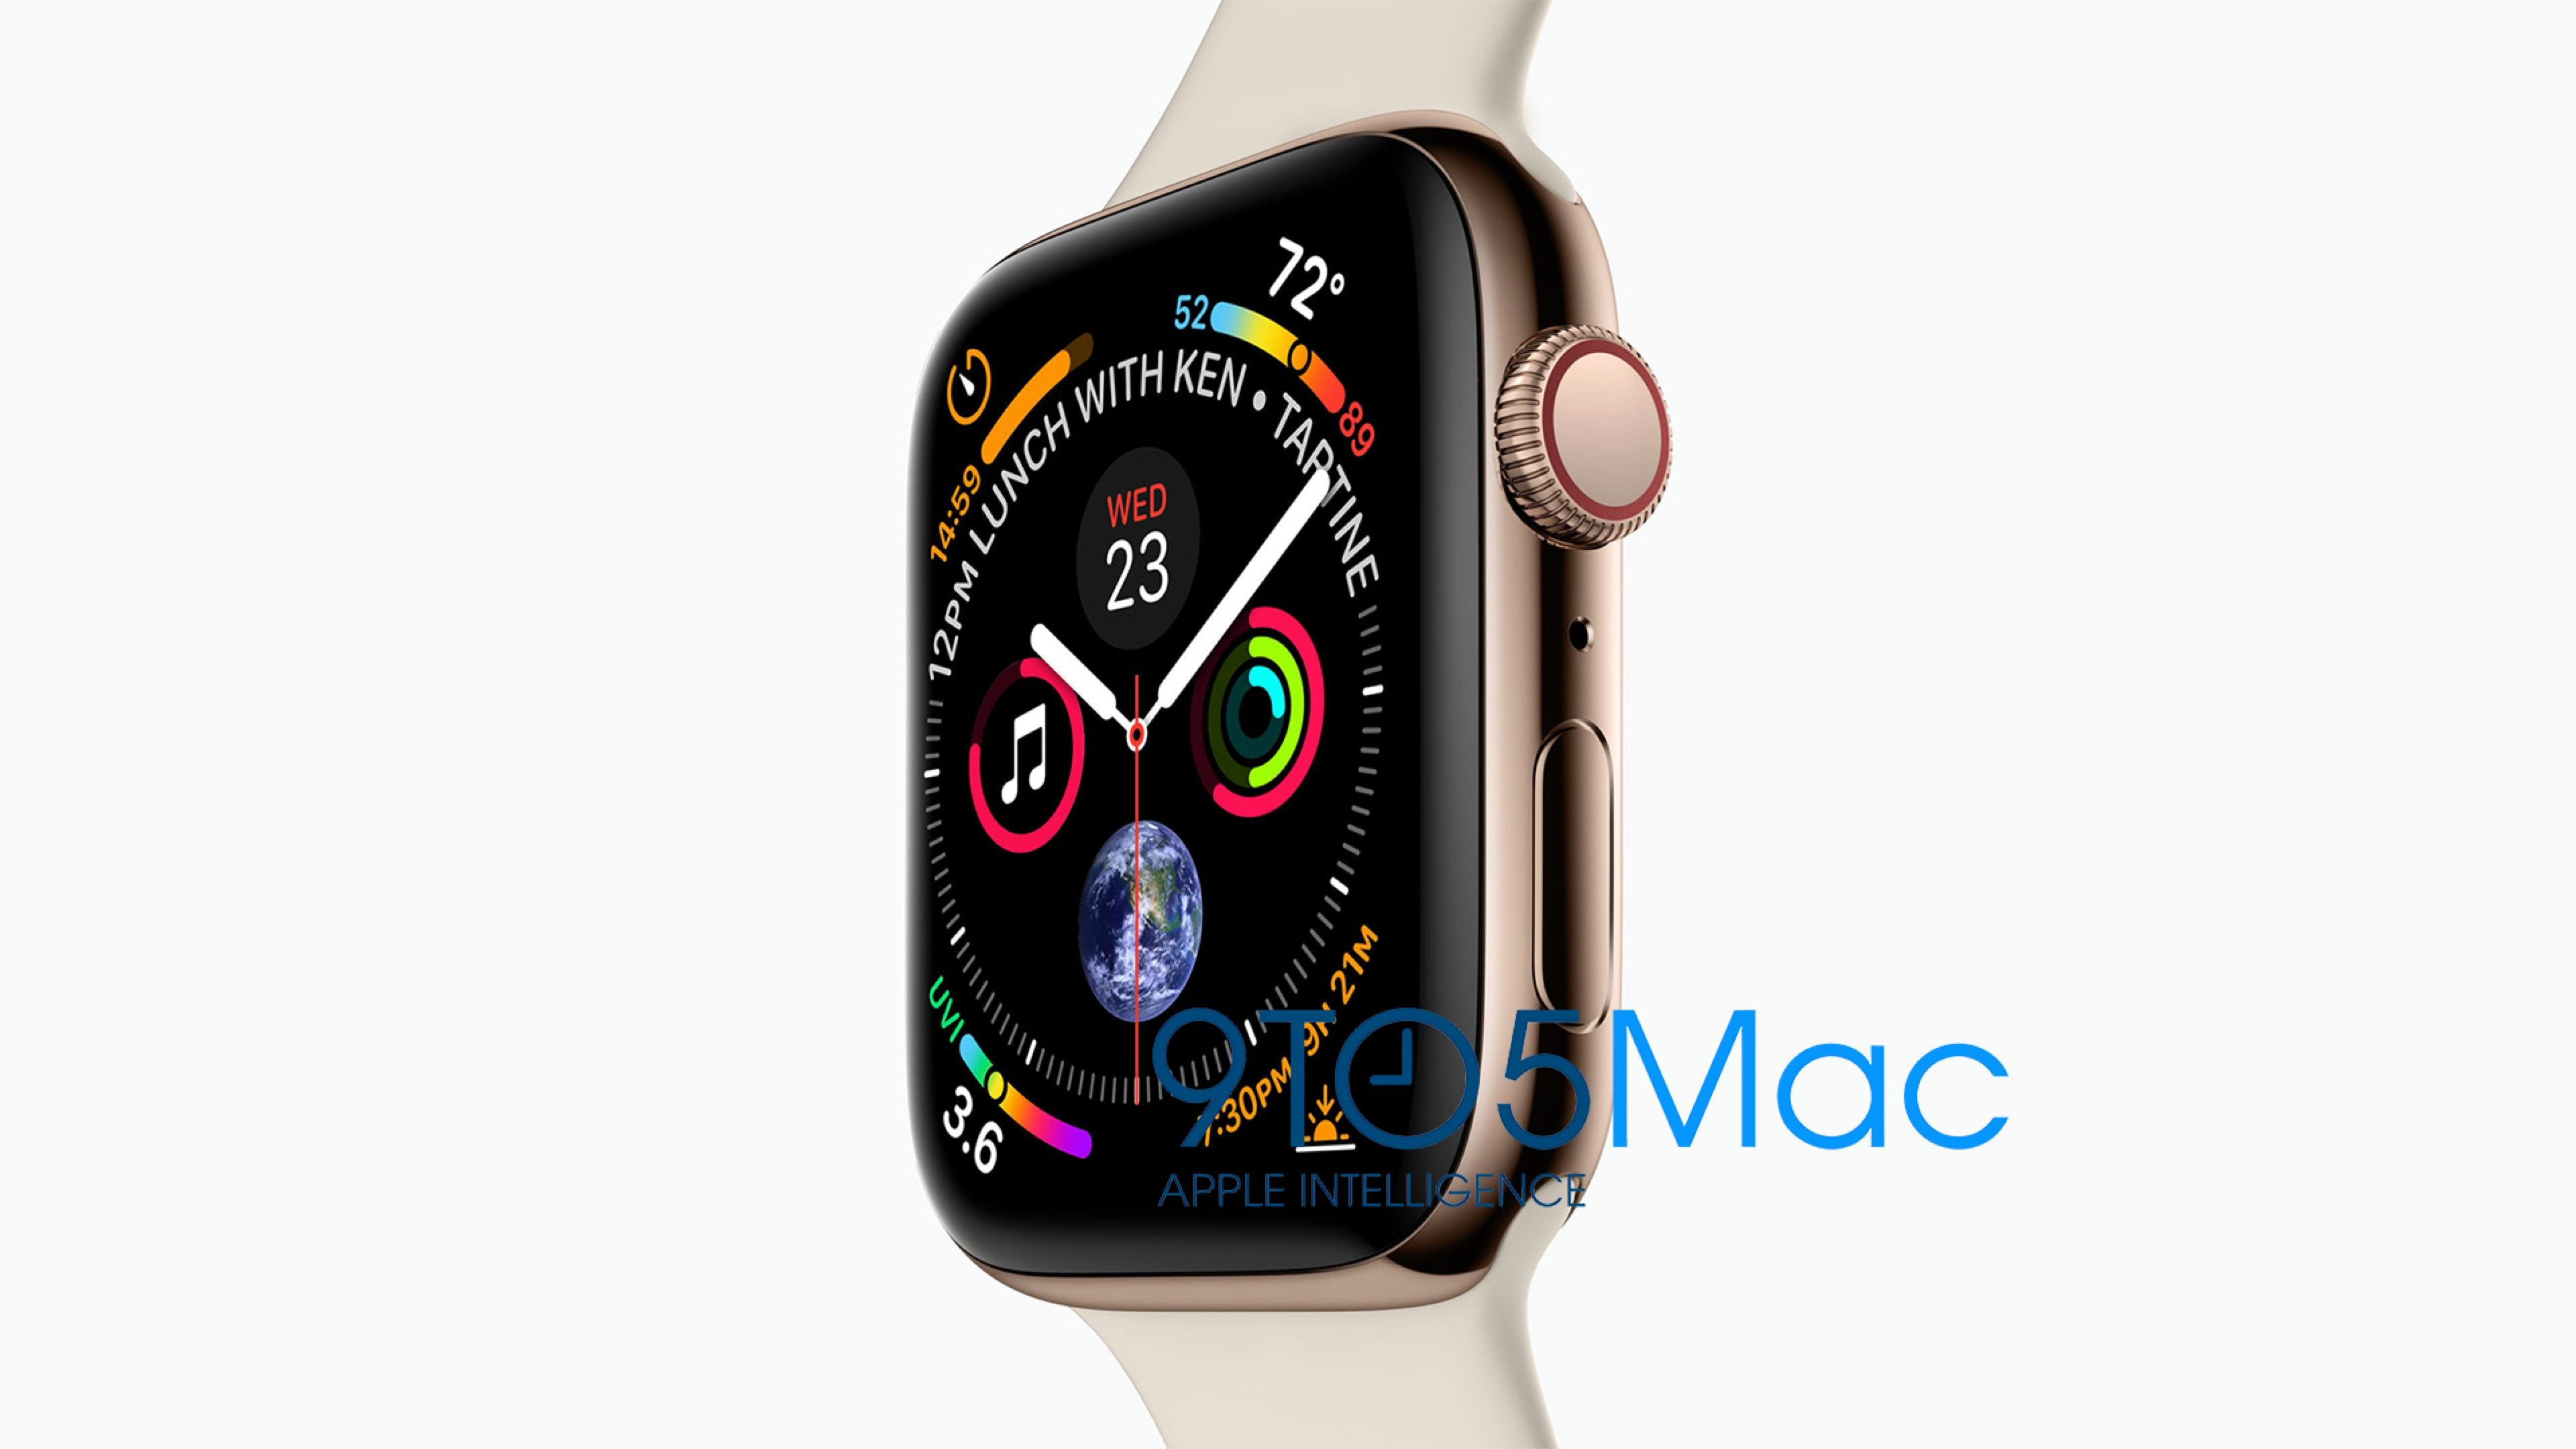 AppleWatch Series4のリーク画像が公開!ベゼルレス!ゴールドステンレス(?)の新色ケース!新しい文字盤!